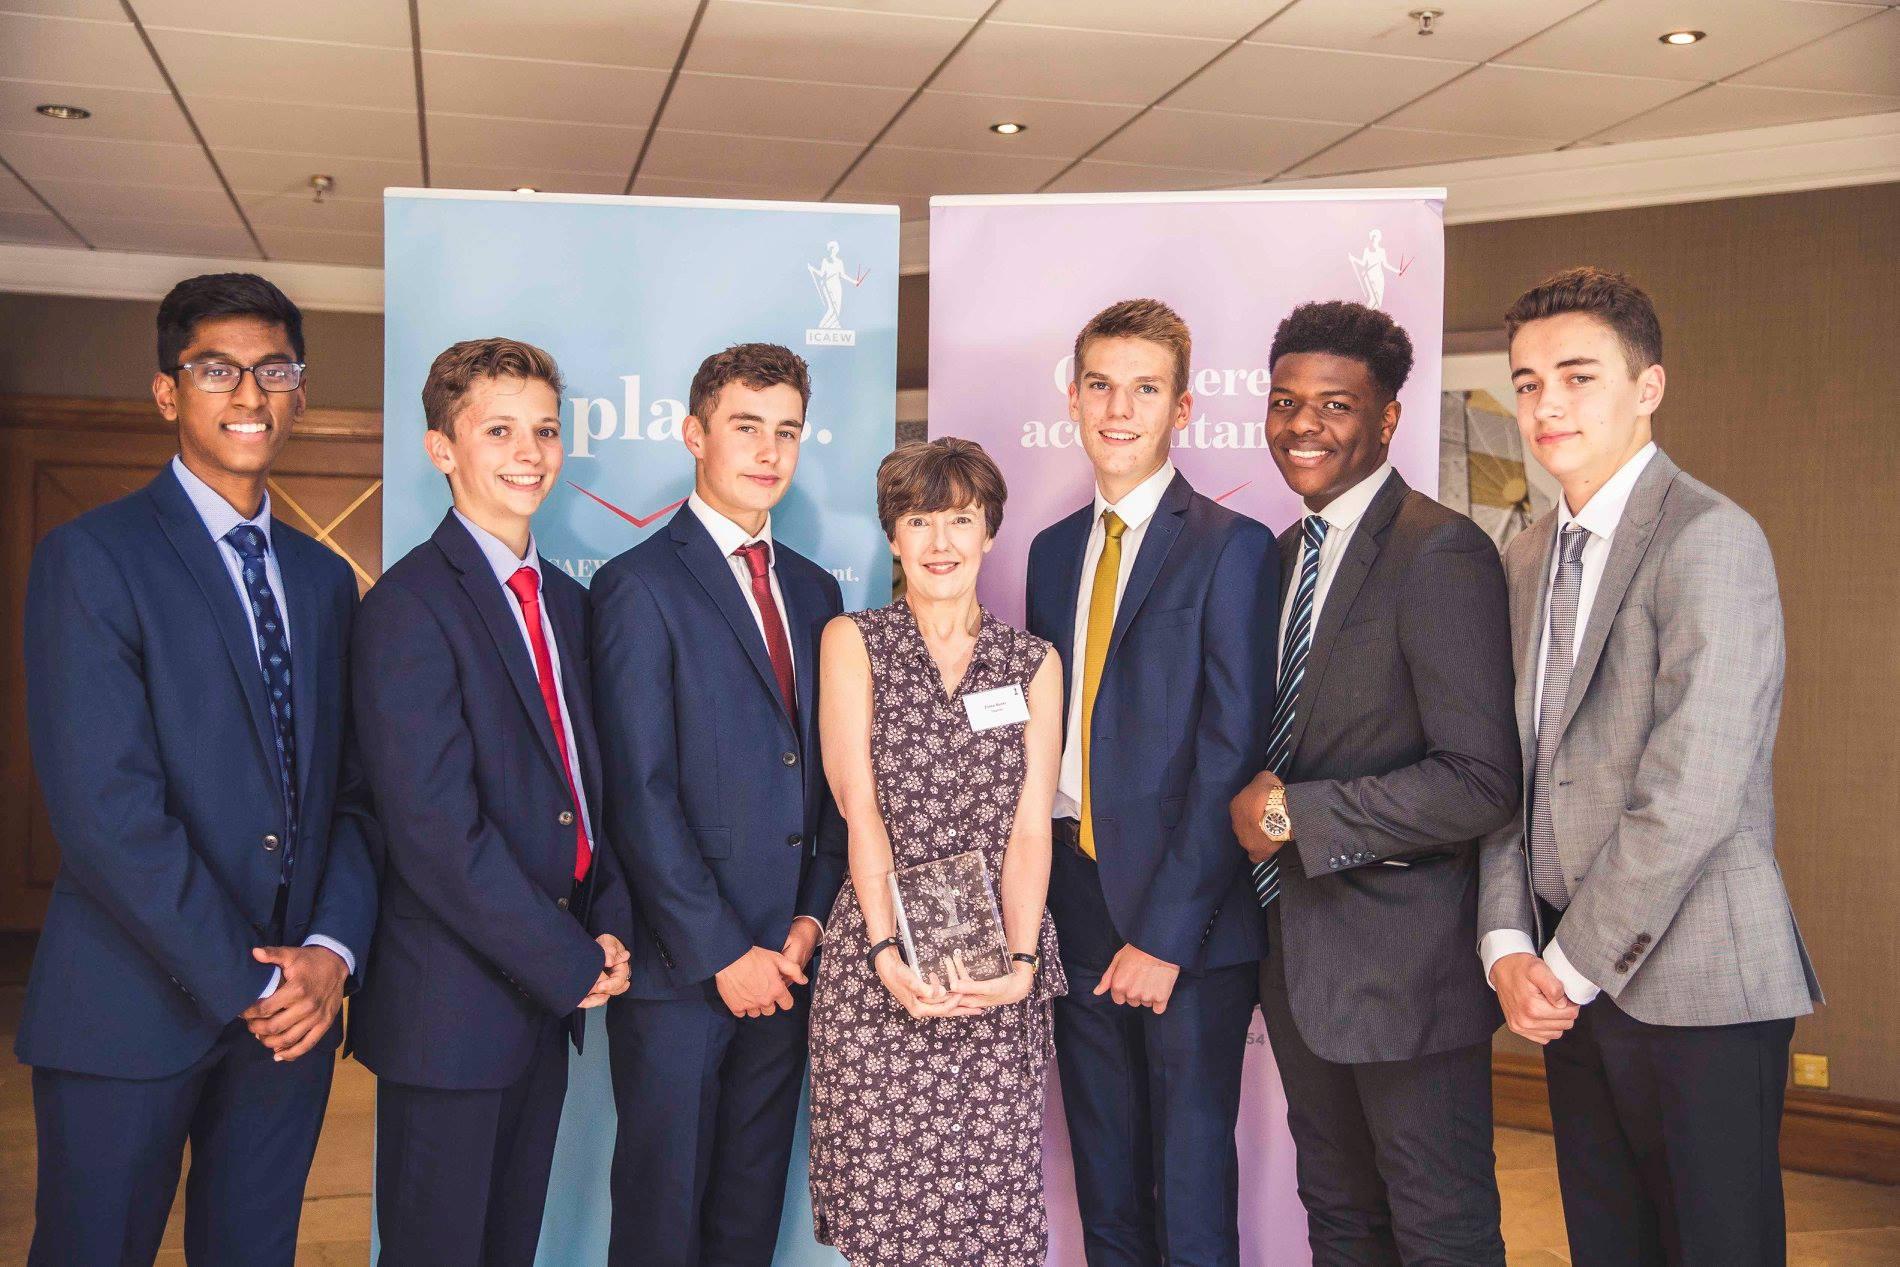 BASE winners 2018, Sir Thomas Rich's School